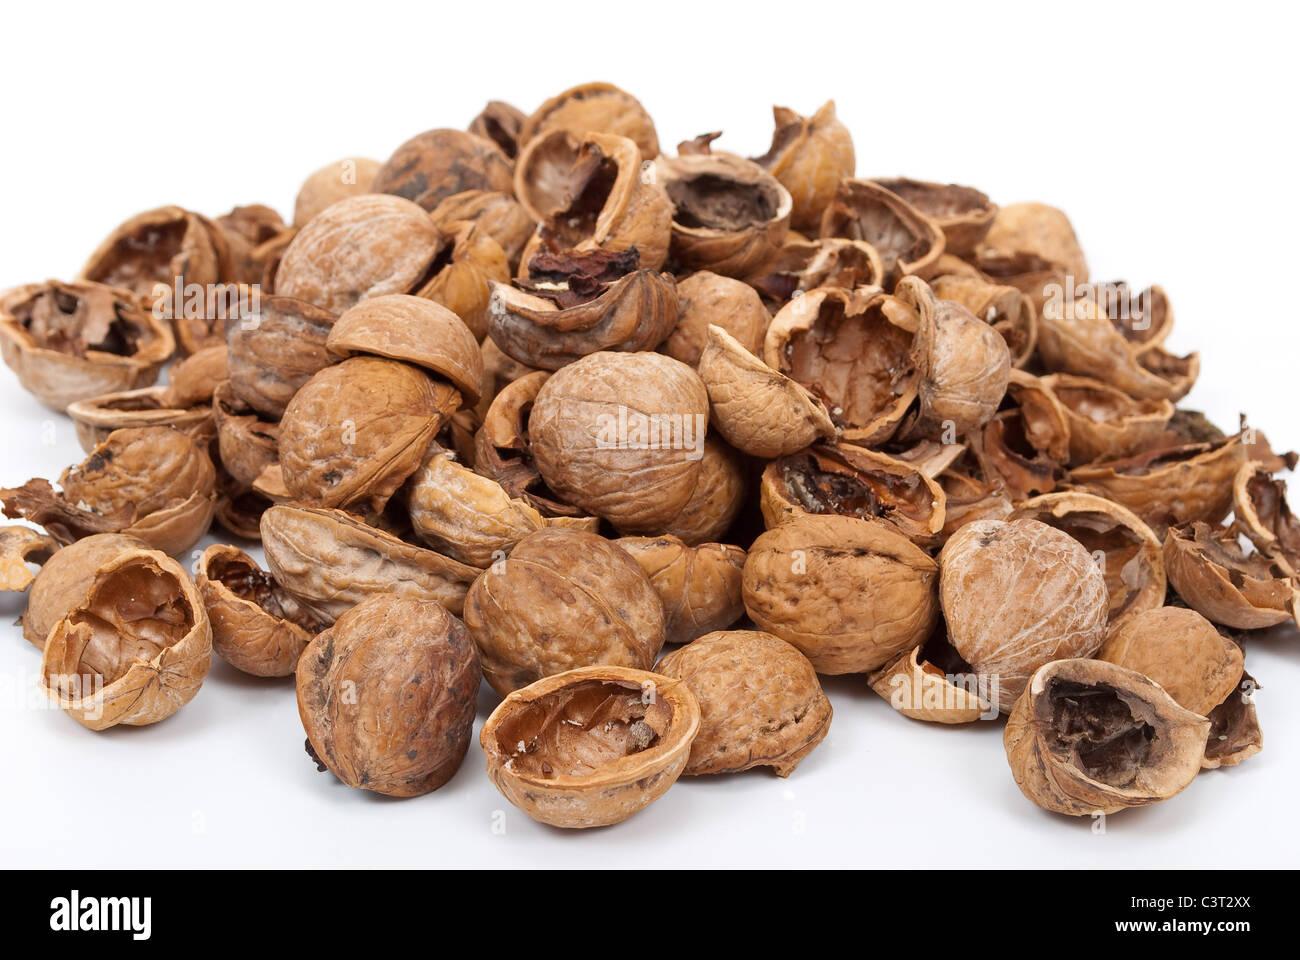 Walnut shell - Stock Image